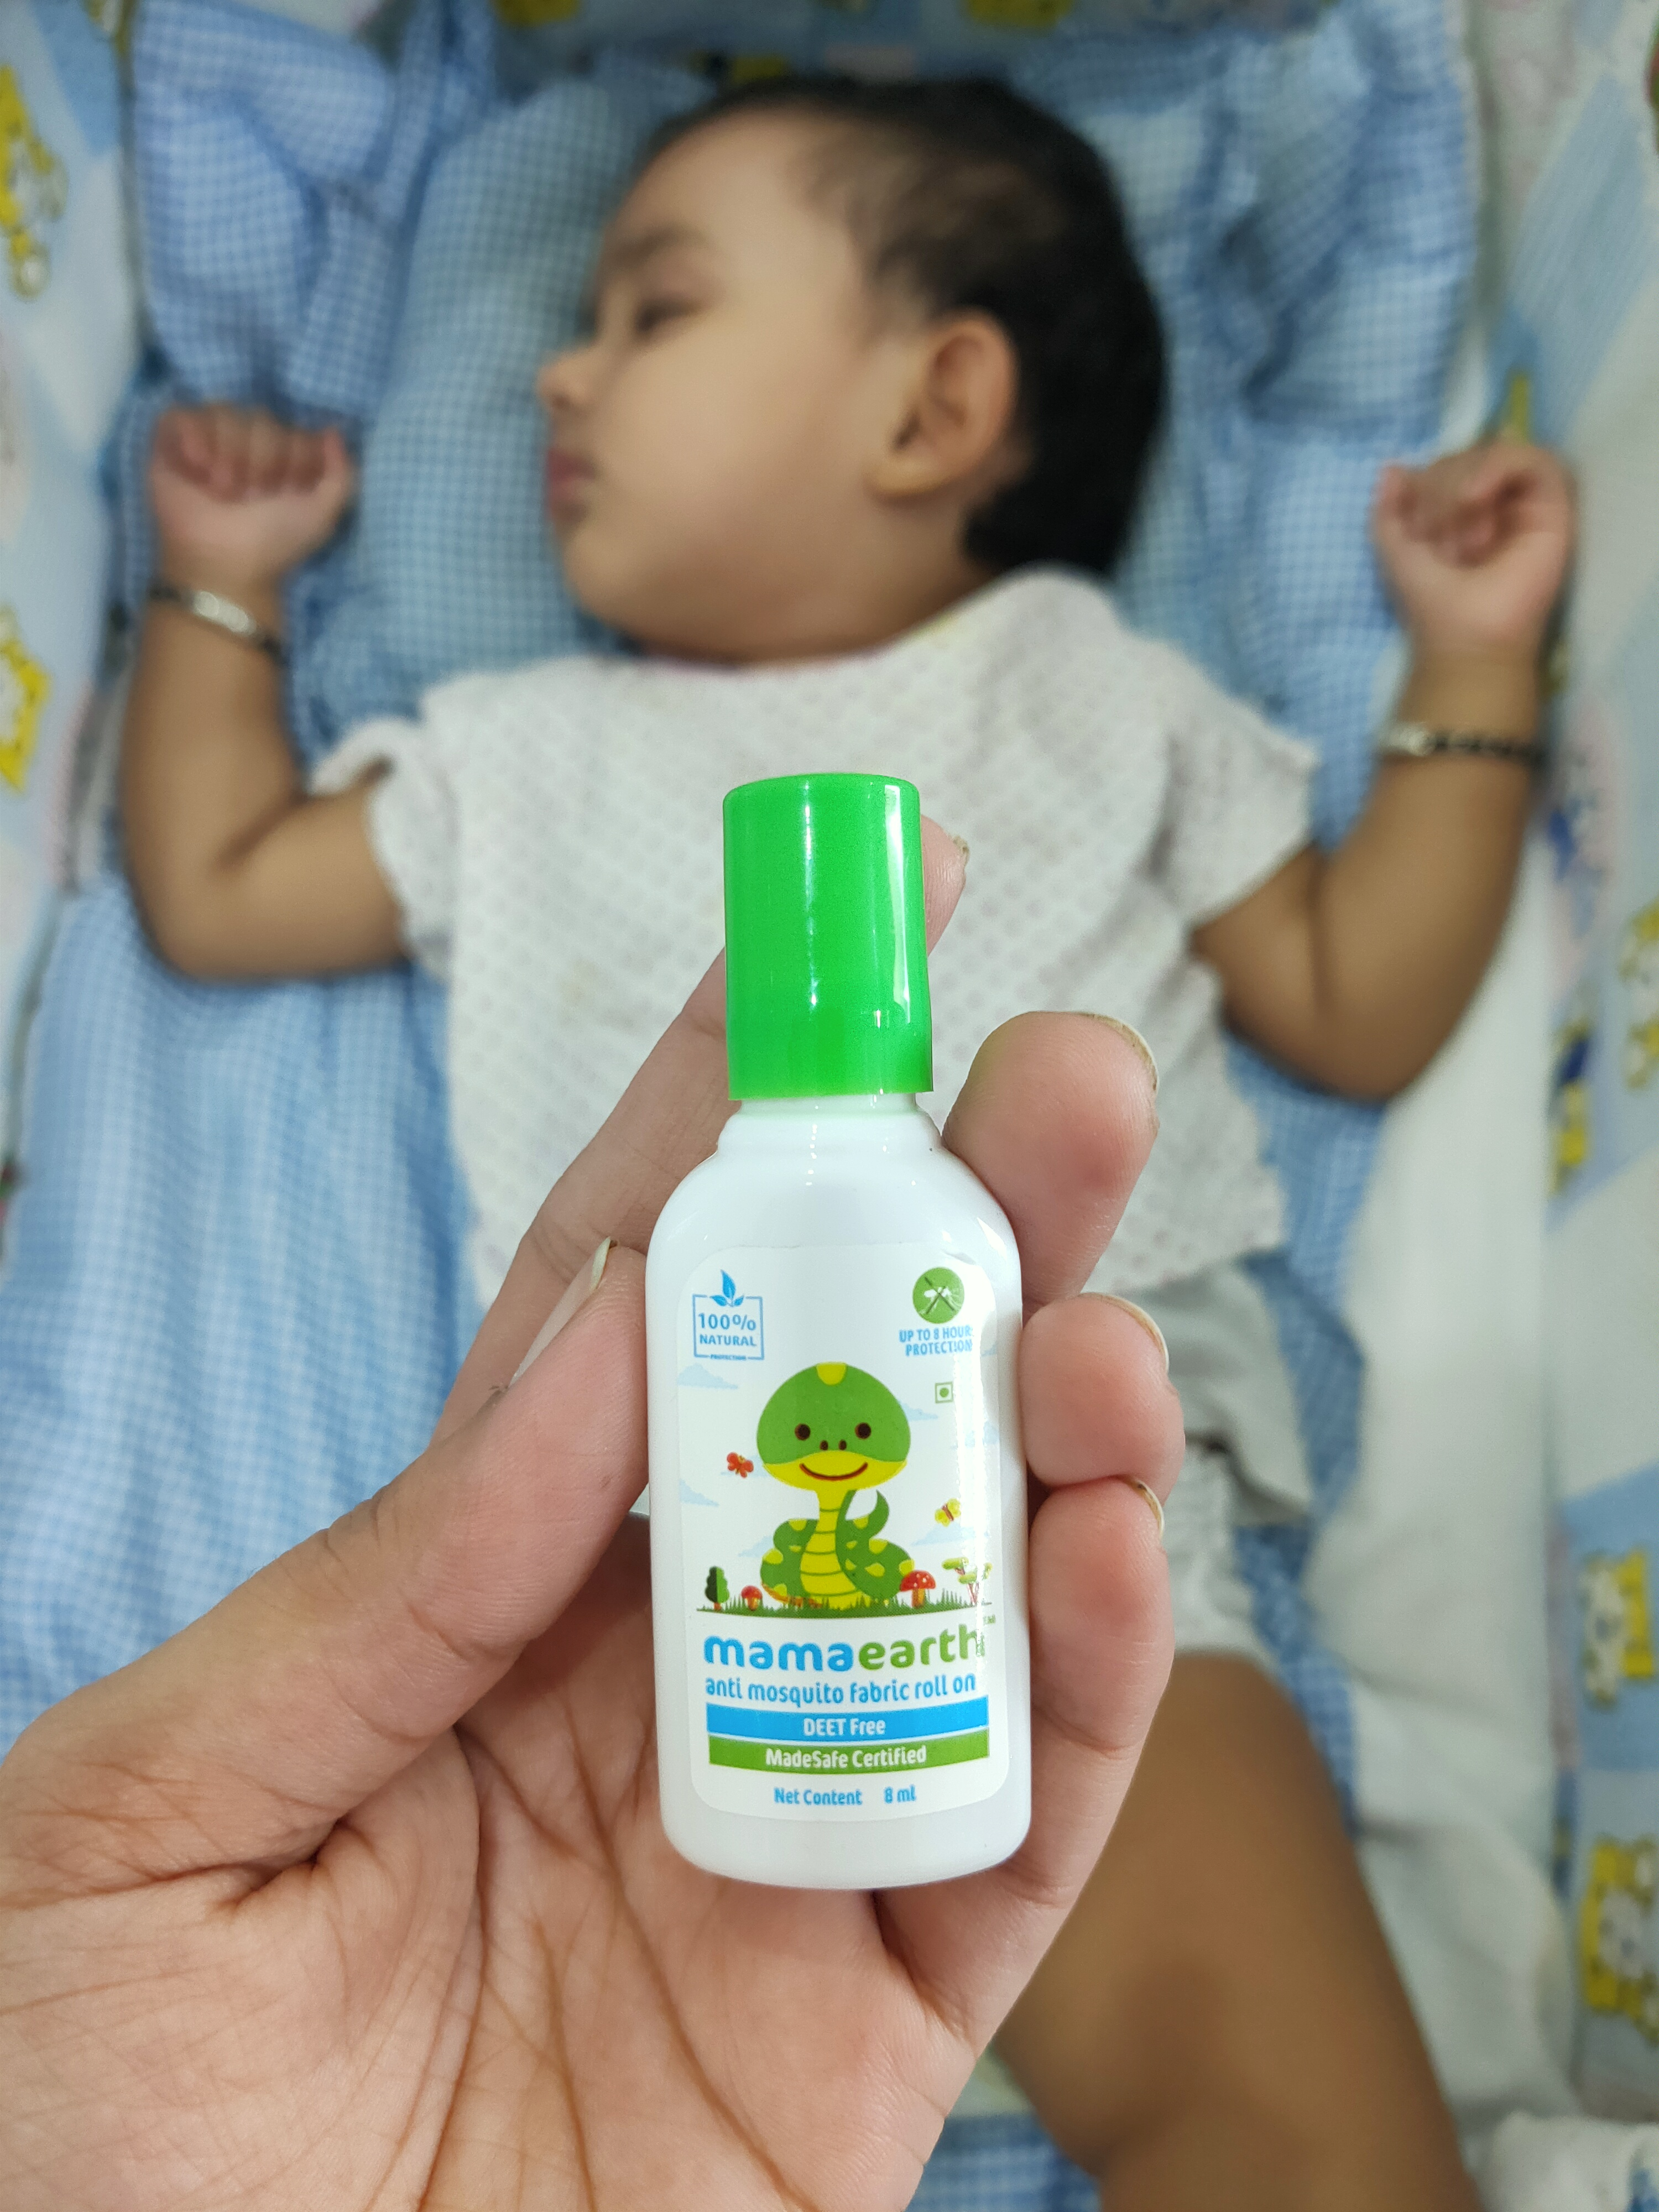 Mamaearth Anti Mosquito Fabric Roll On-Effective-By madaanritu